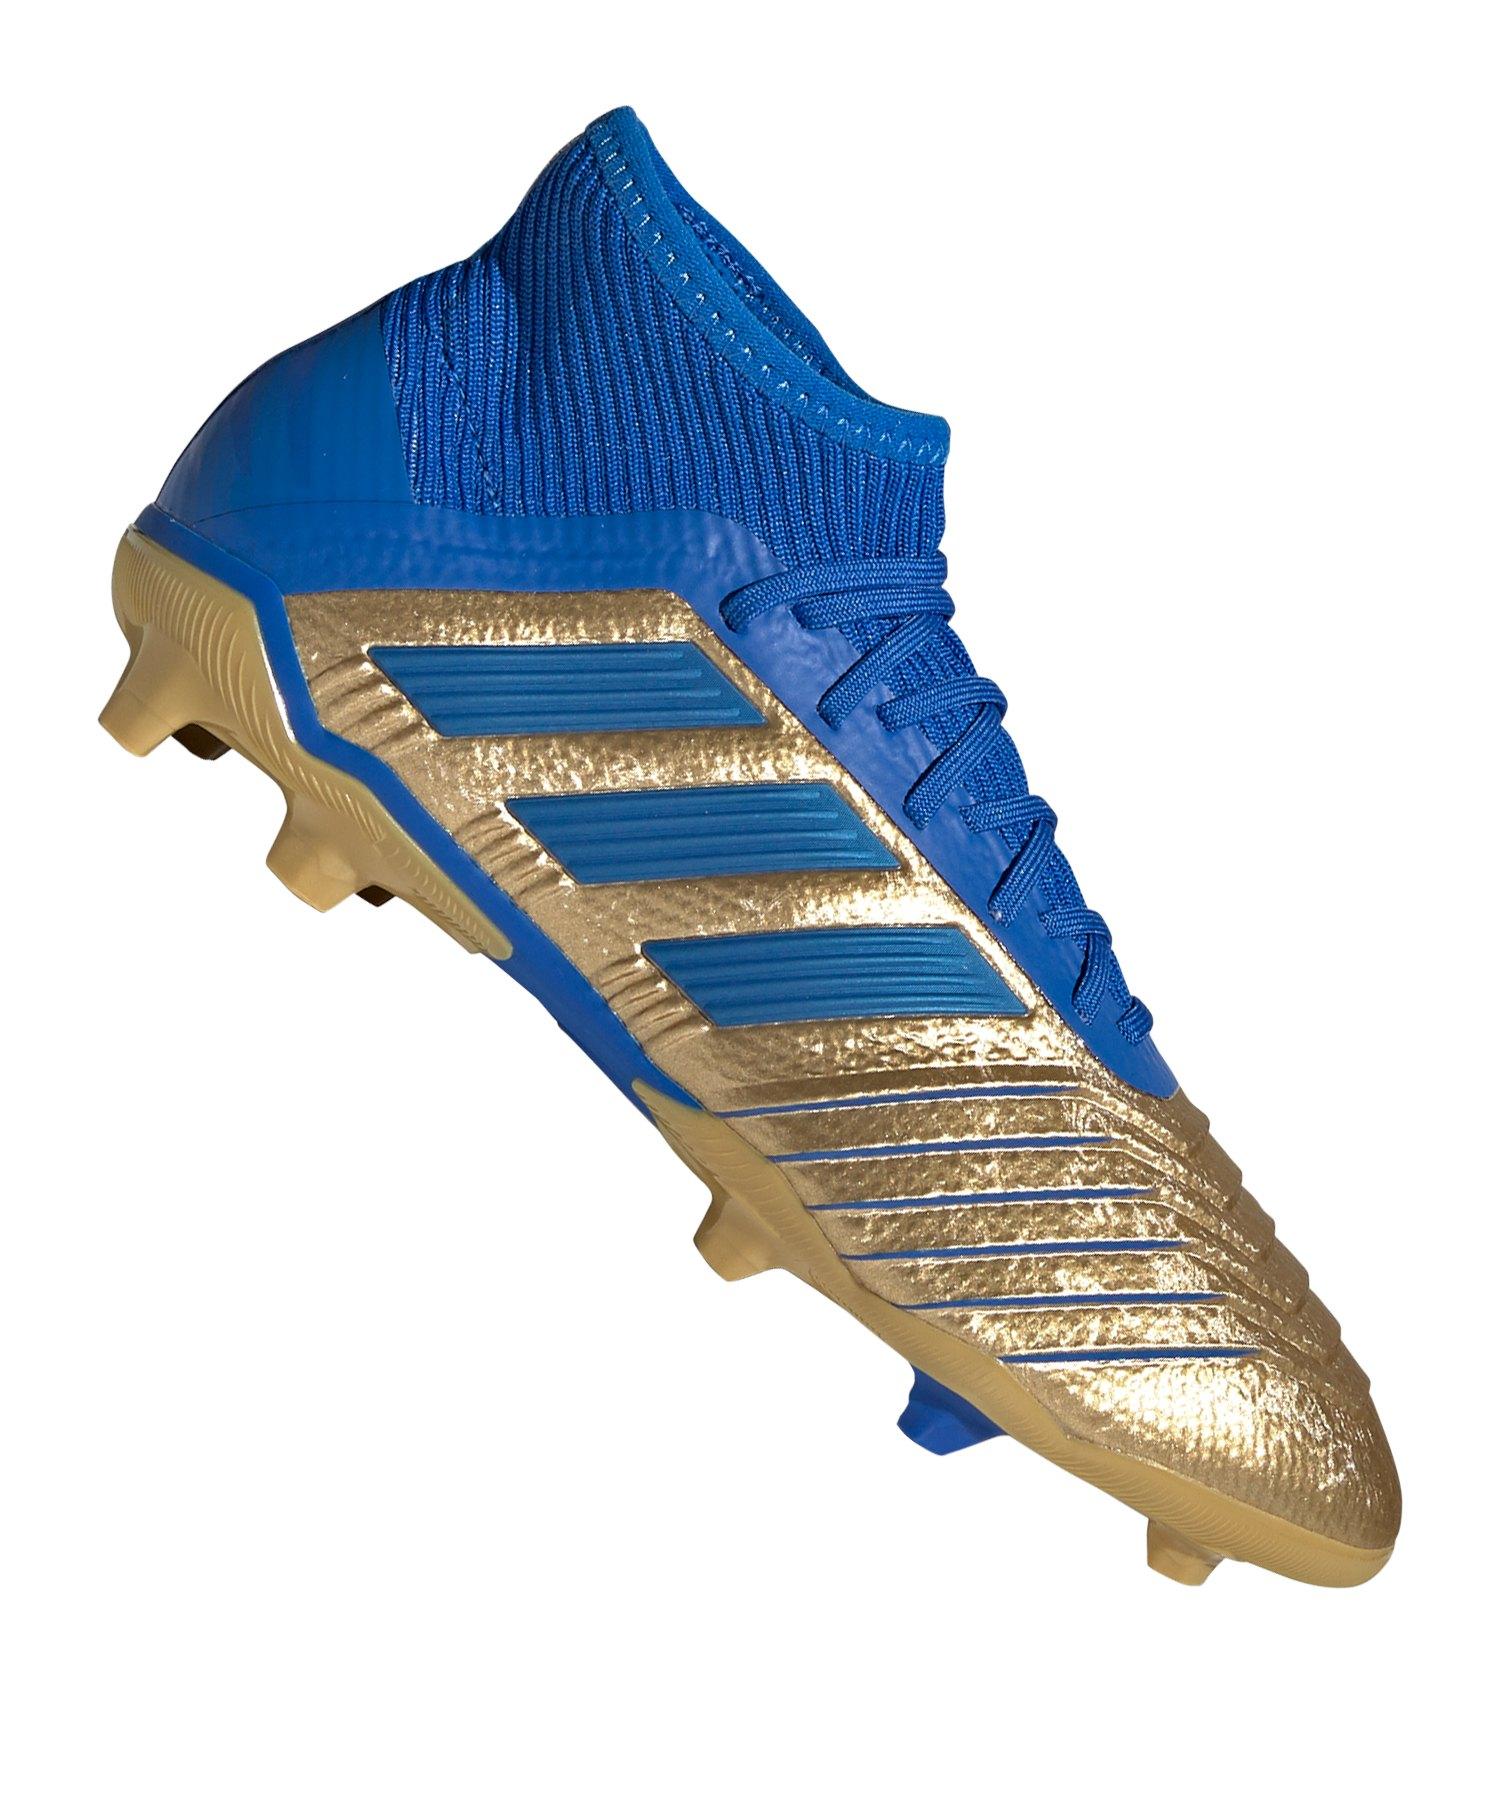 adidas Predator 19.1 FG Kids Gold Blau - gold